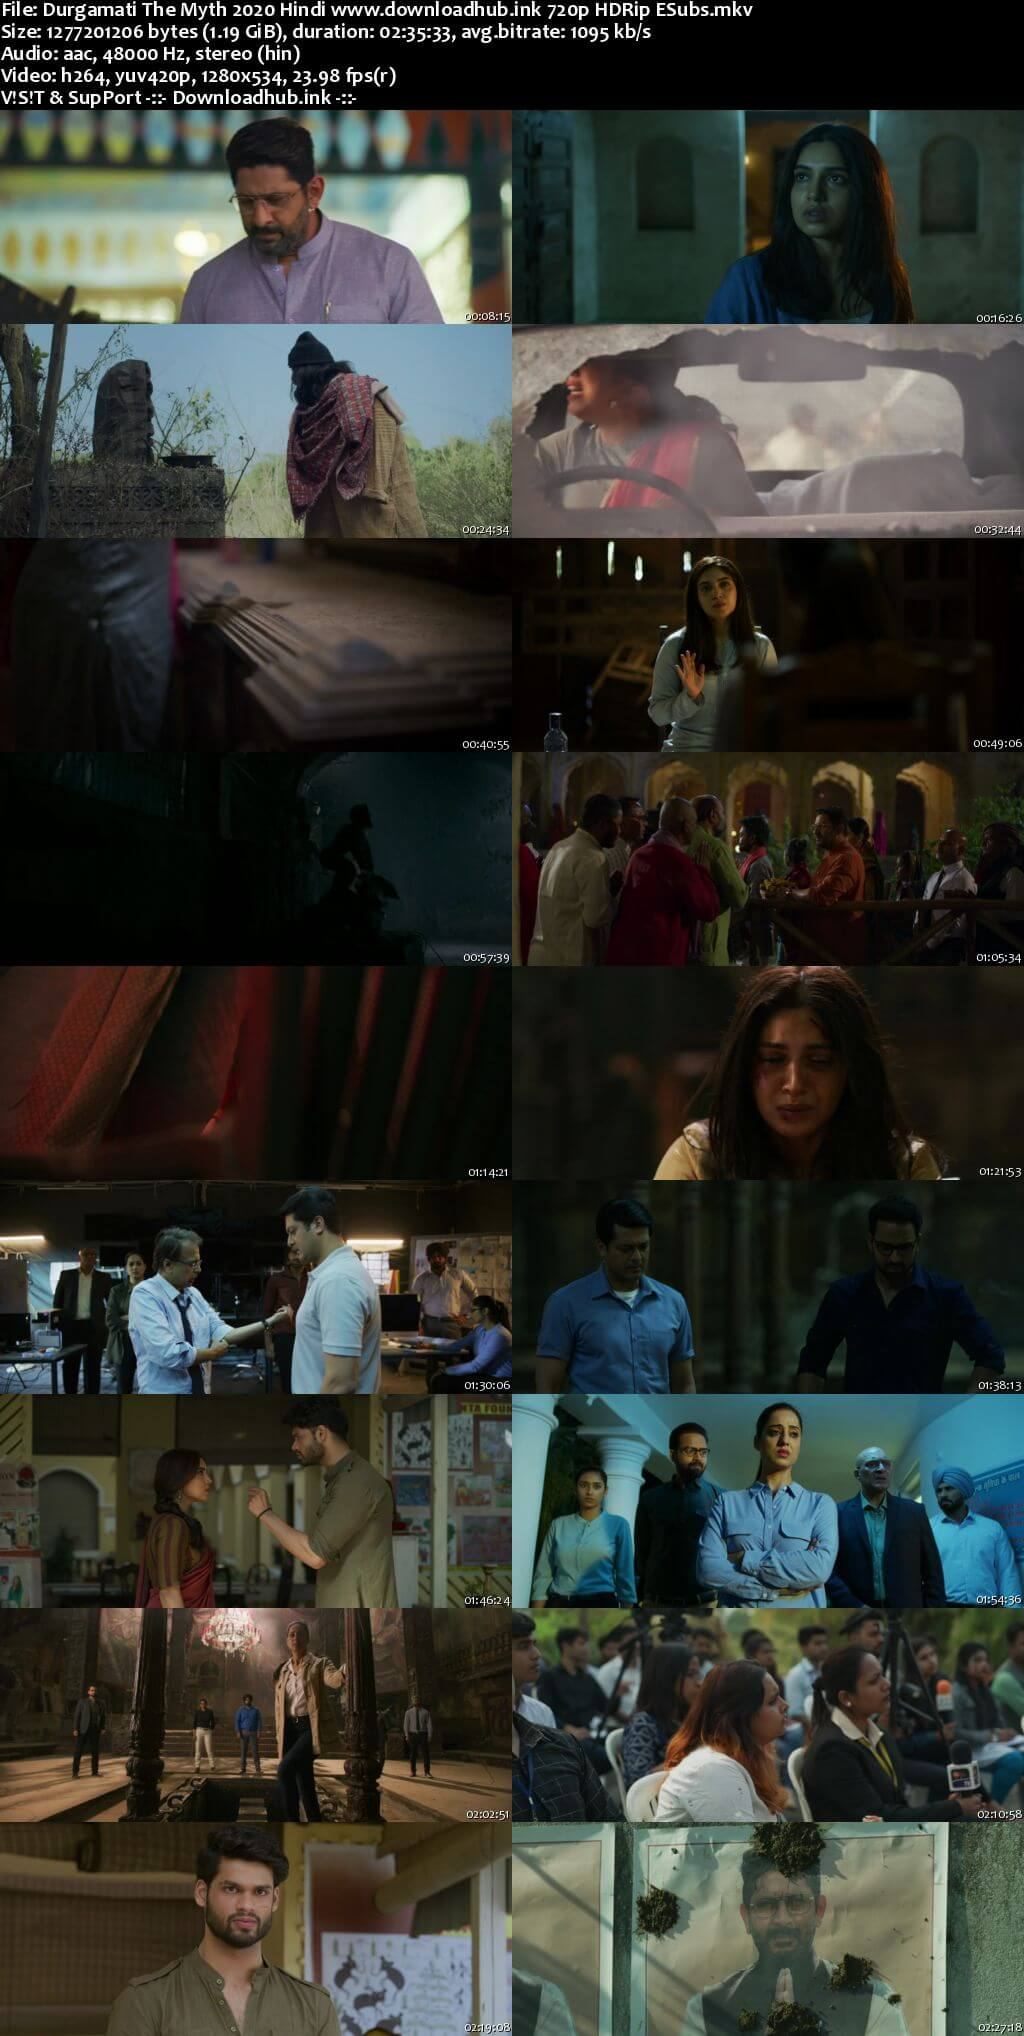 Durgamati The Myth 2020 Hindi 720p HDRip ESubs